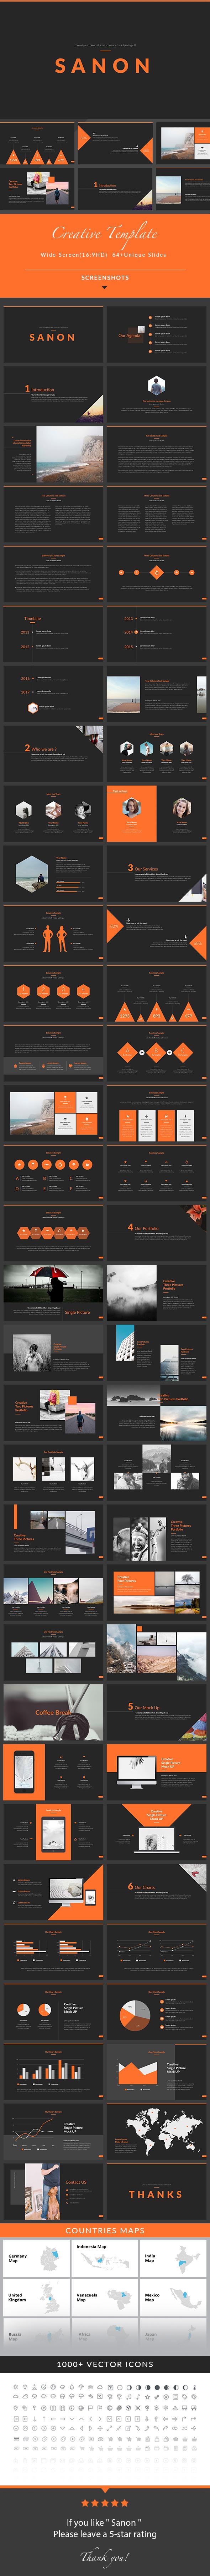 Sanon - PowerPoint Presentation Template - Creative PowerPoint Templates